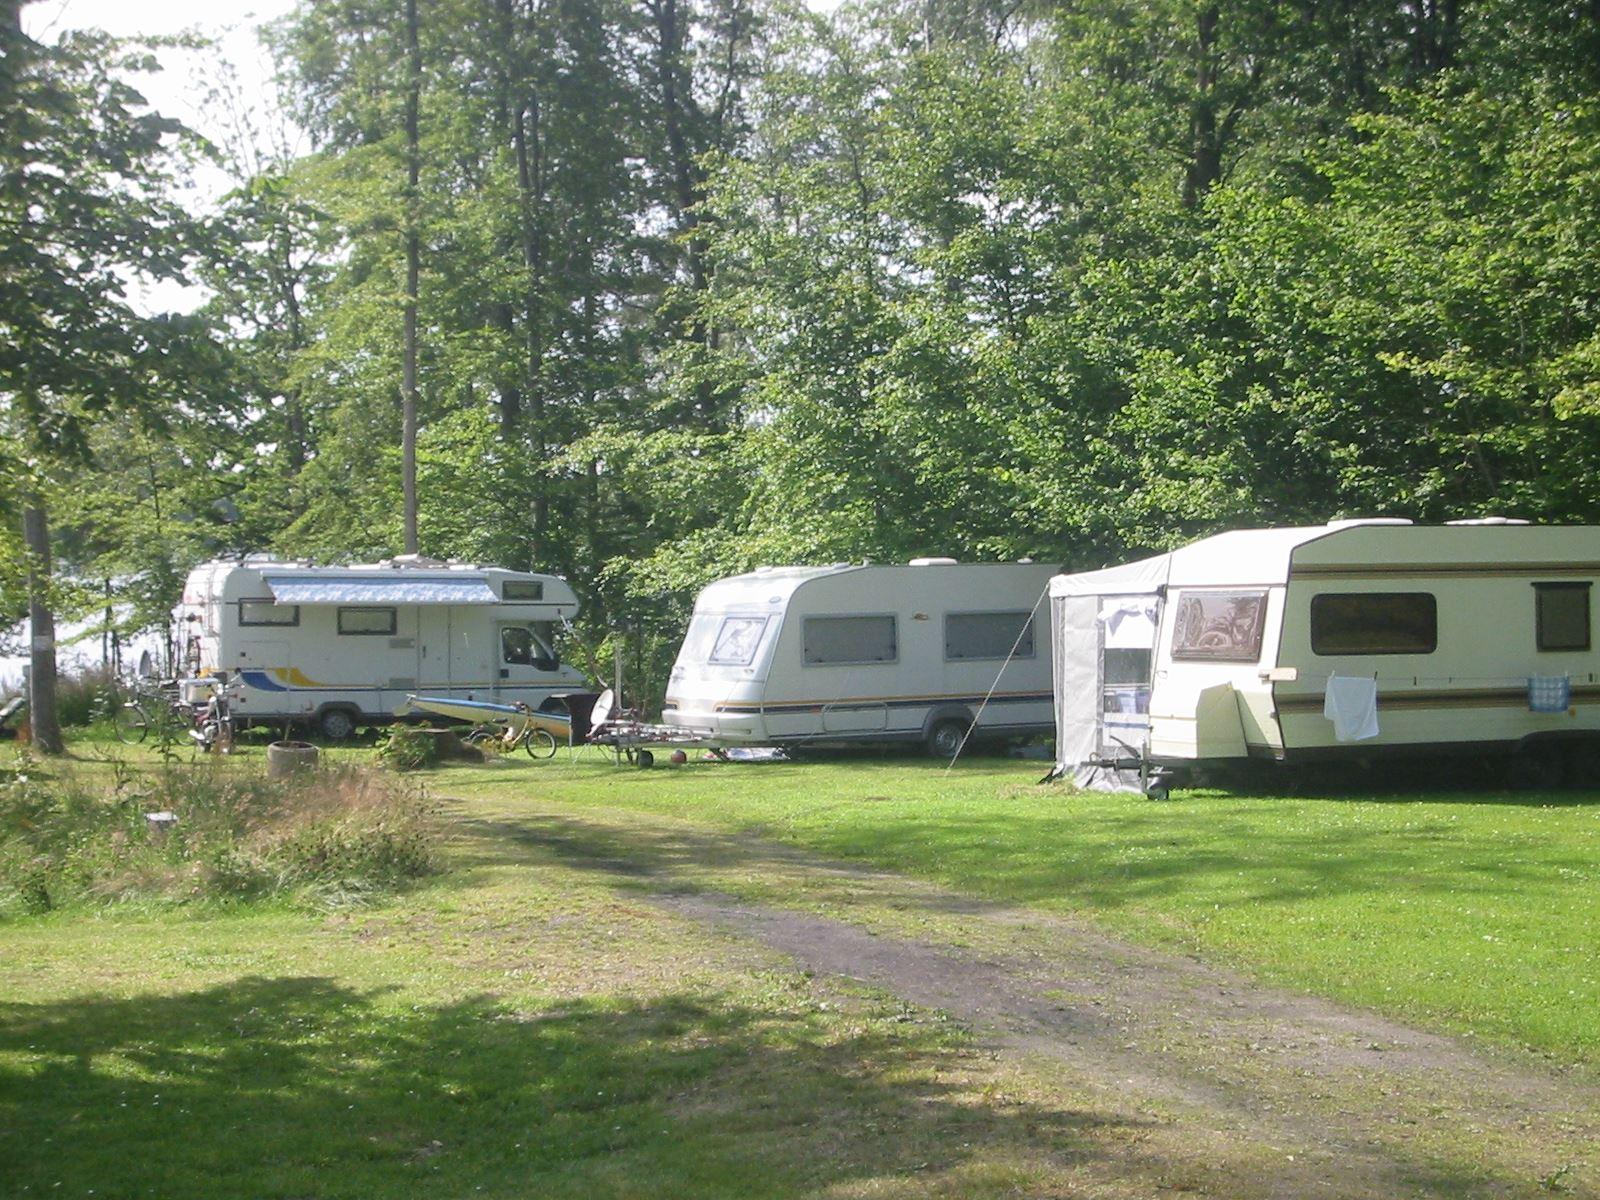 Urshult Camping/Camping